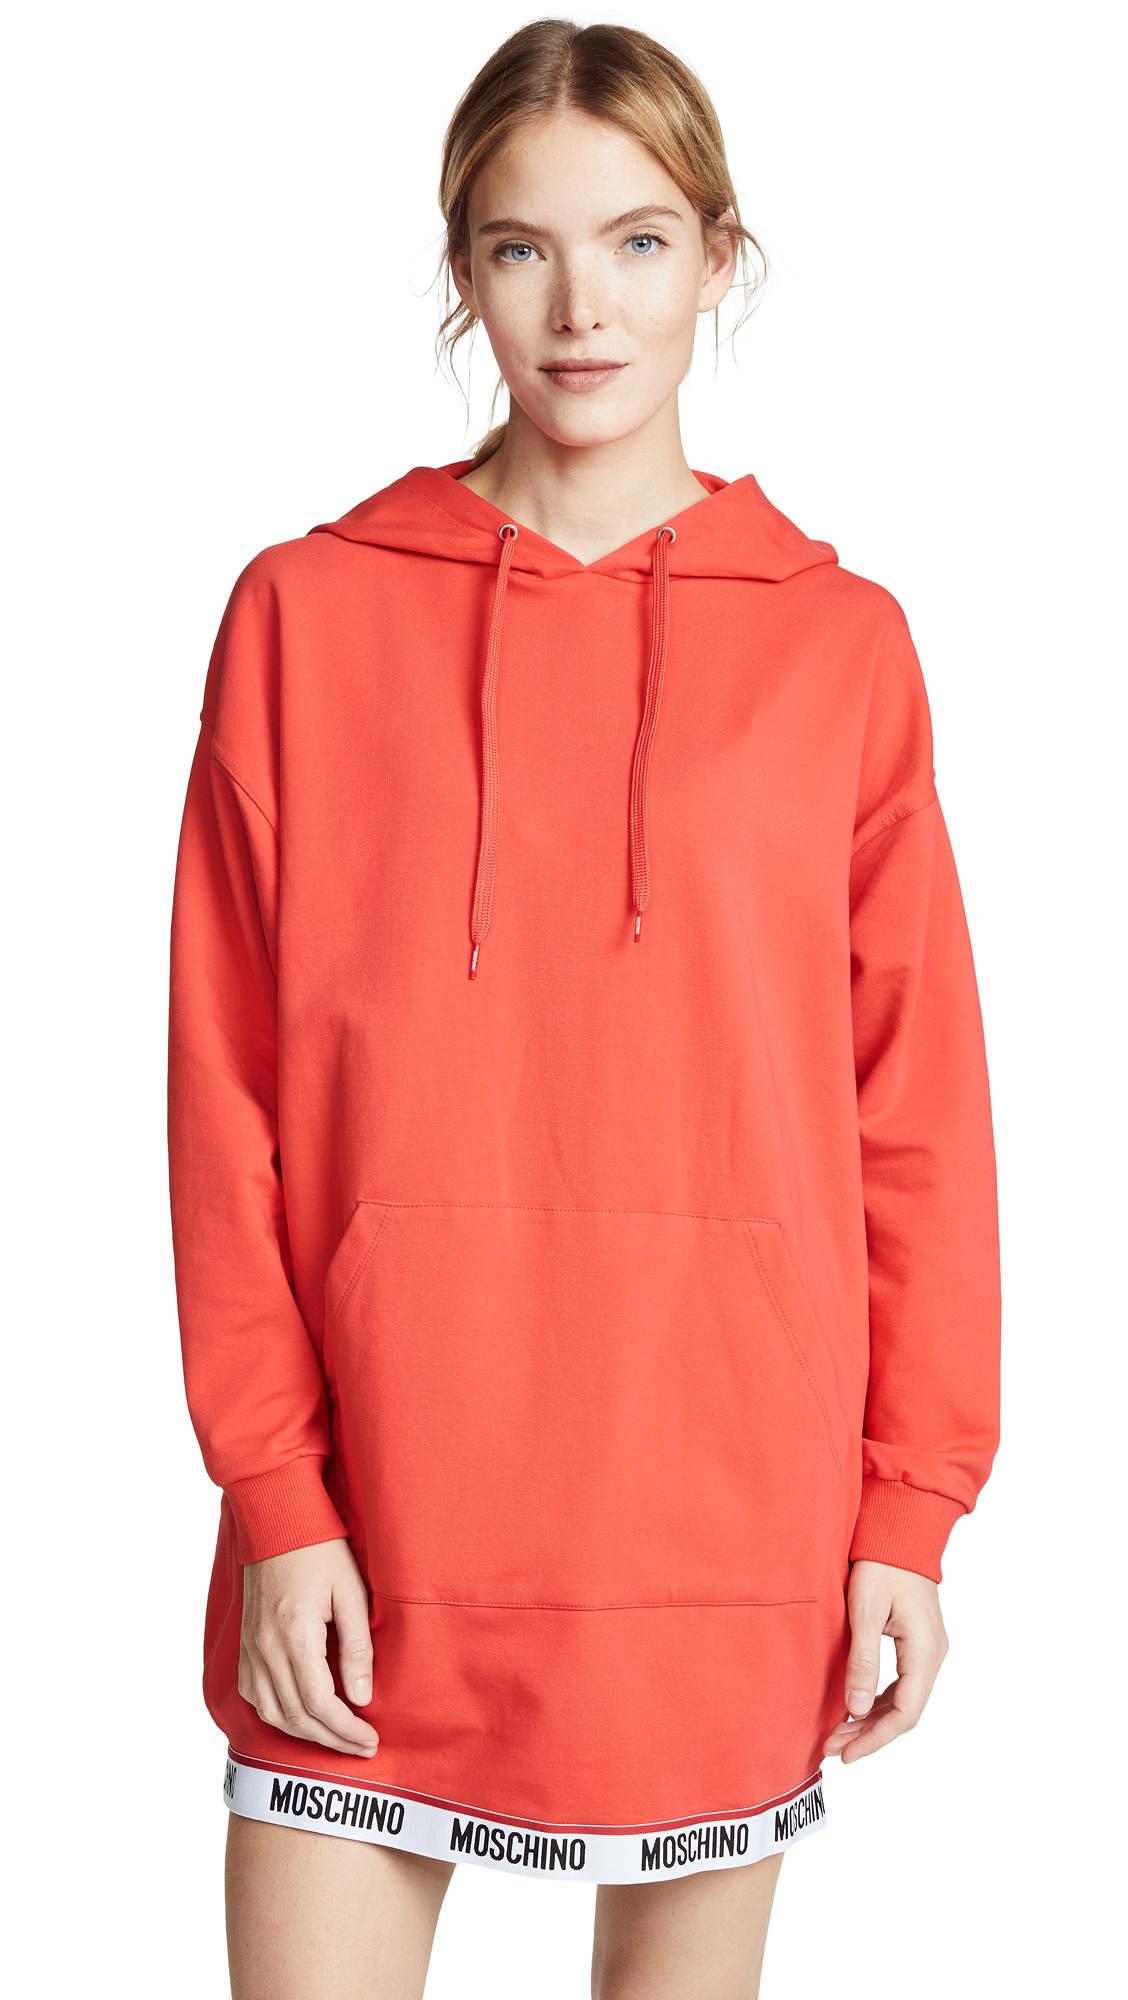 Moschino Hoodie Dress - Red